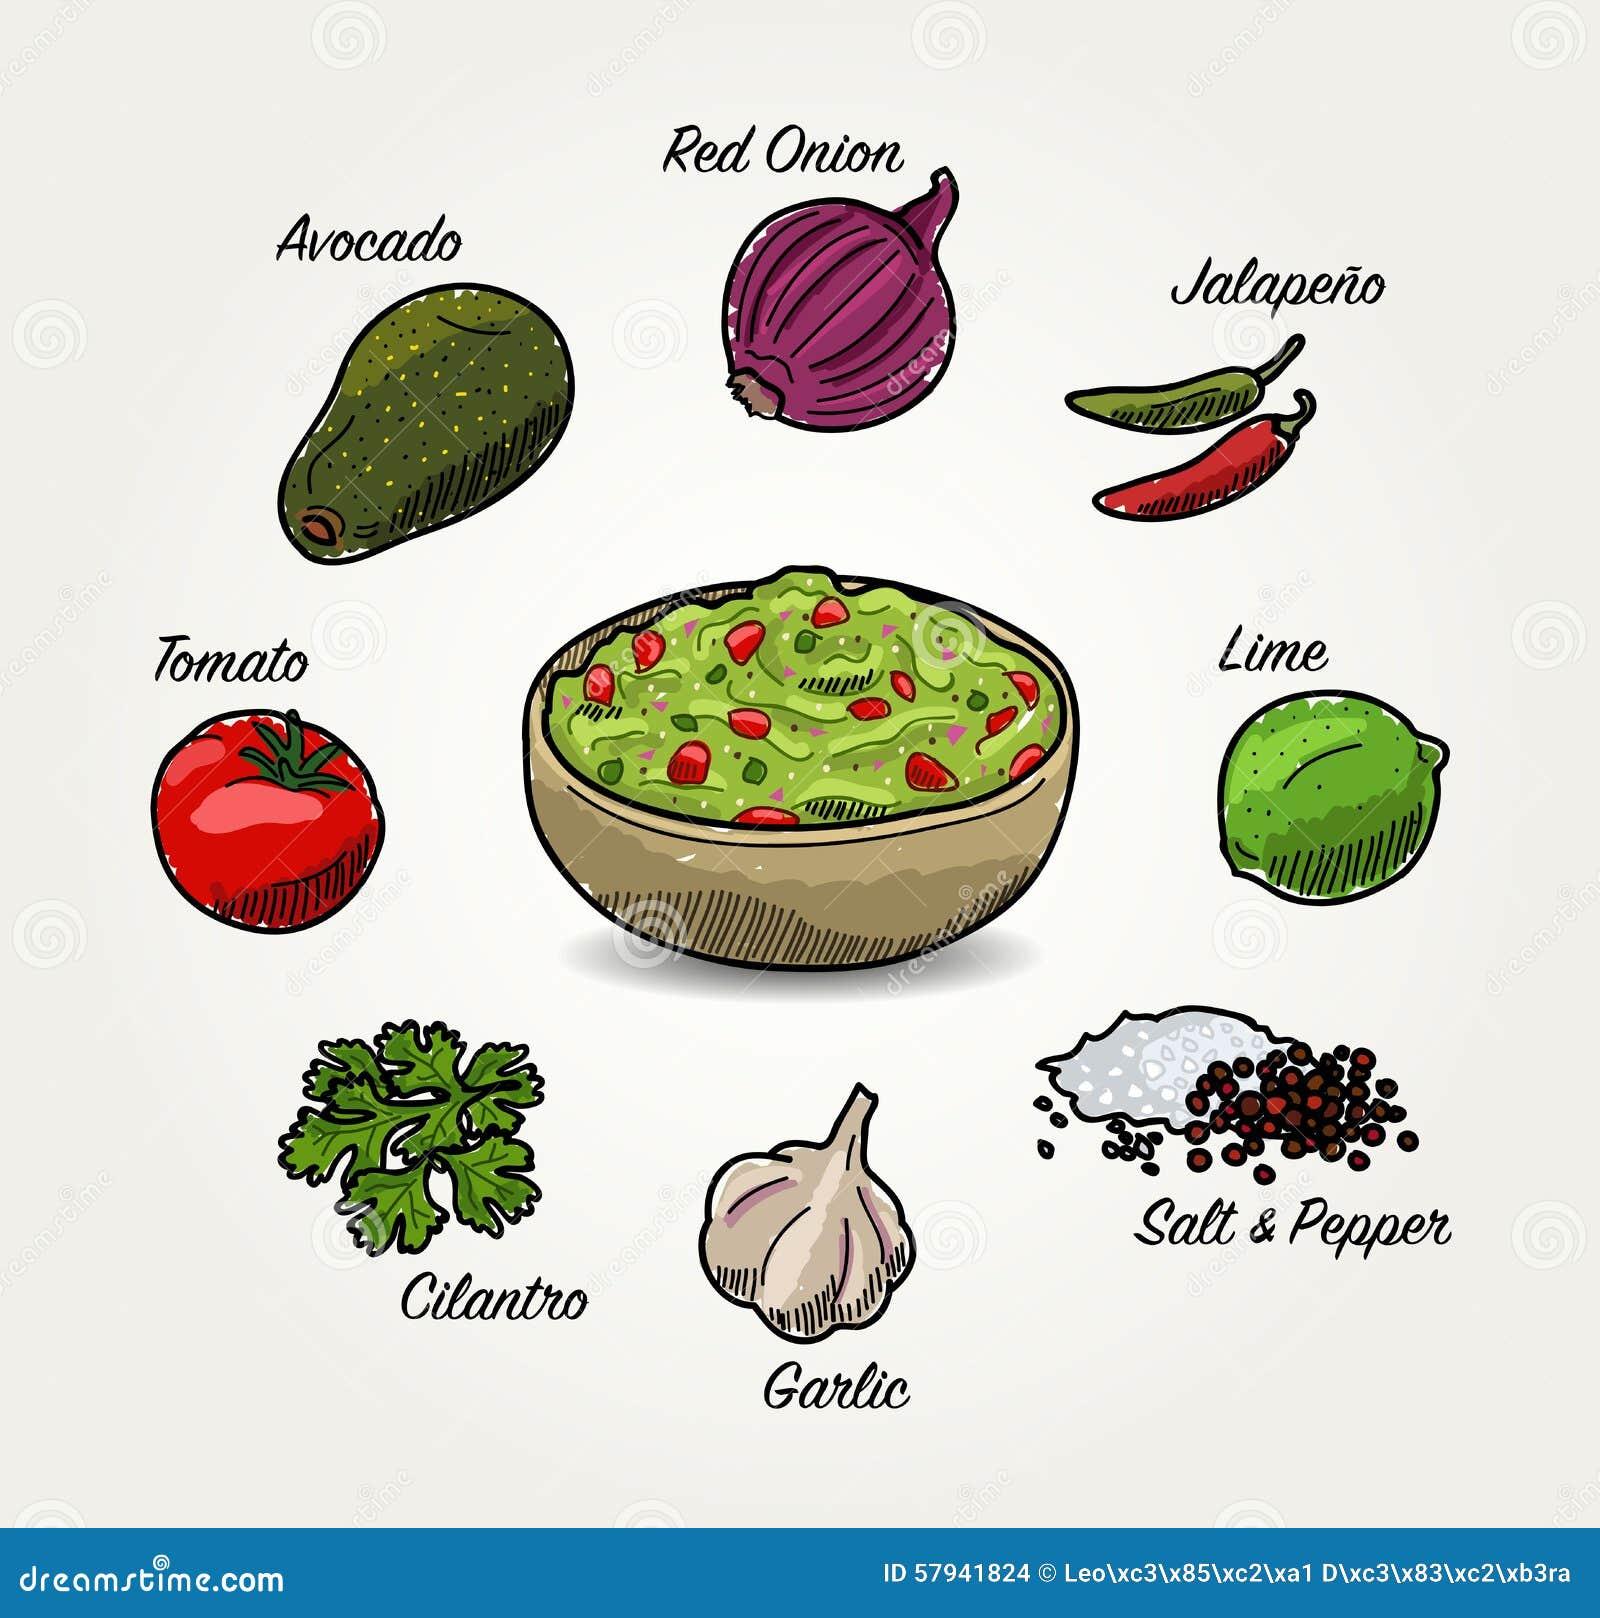 ... red onion, jalapeno, lime, tomato, cilantro, garlic, salt and pepper